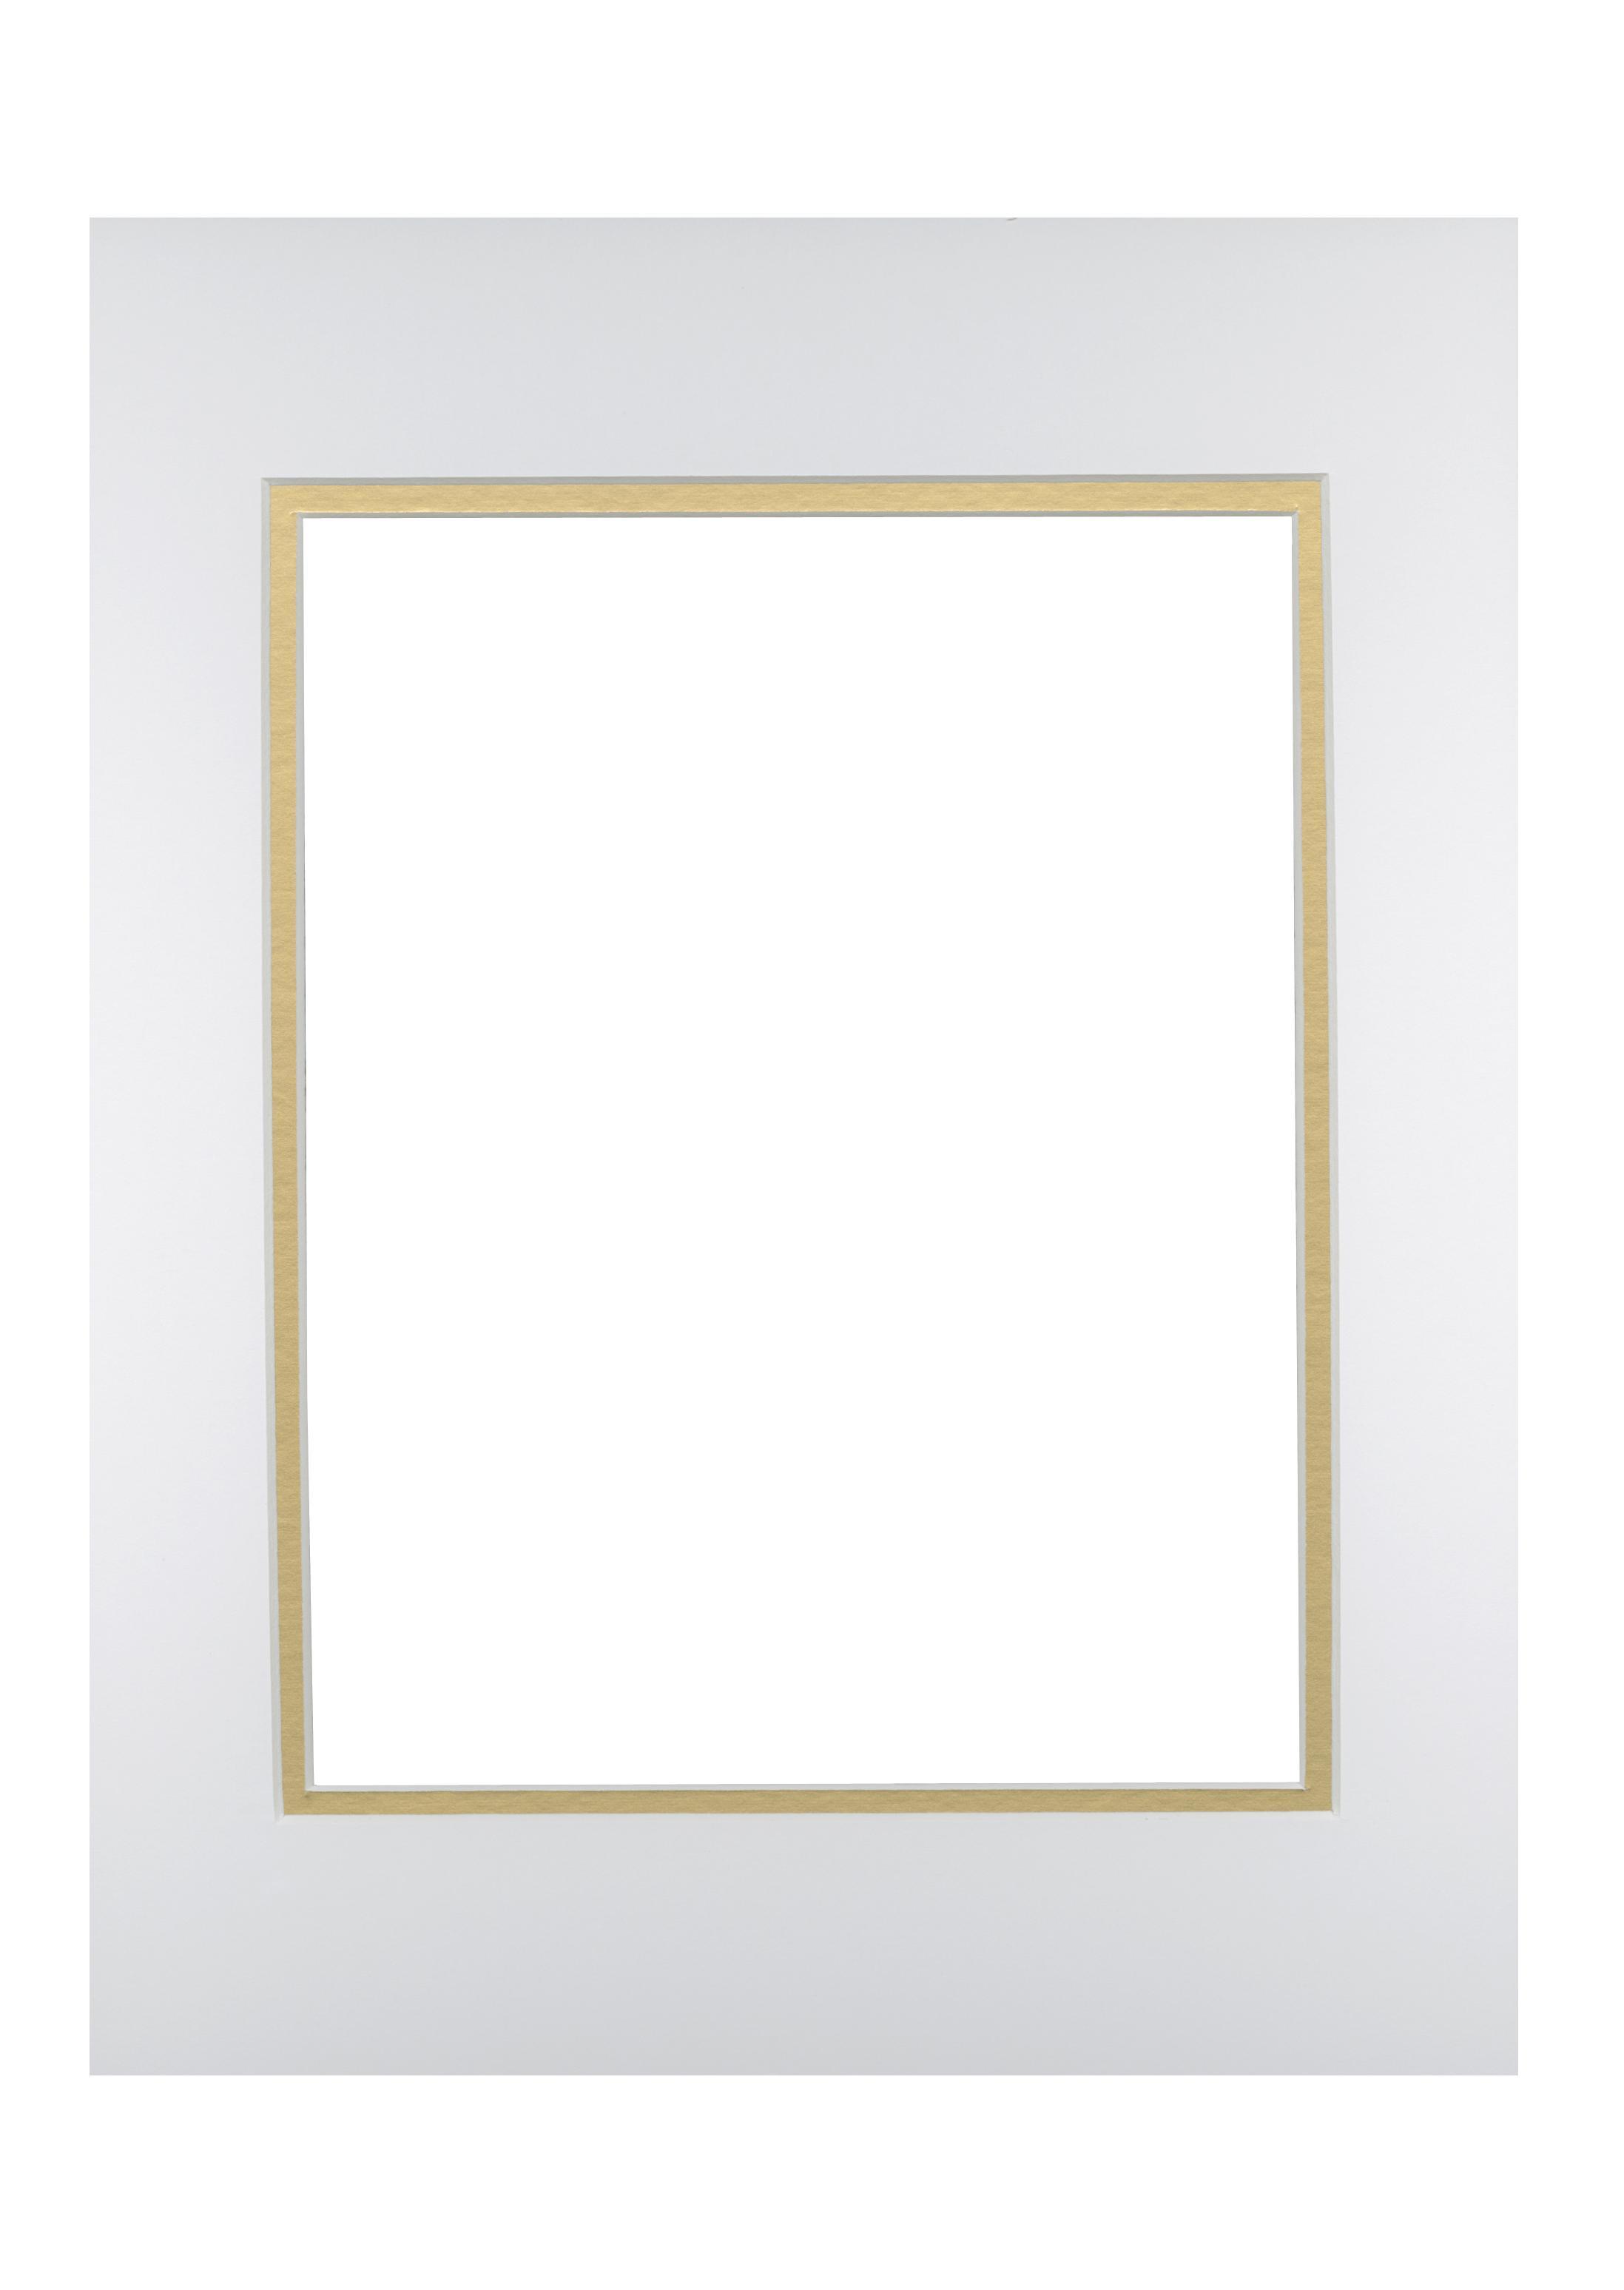 View - White/Gold 11x14 | Timeless Frames